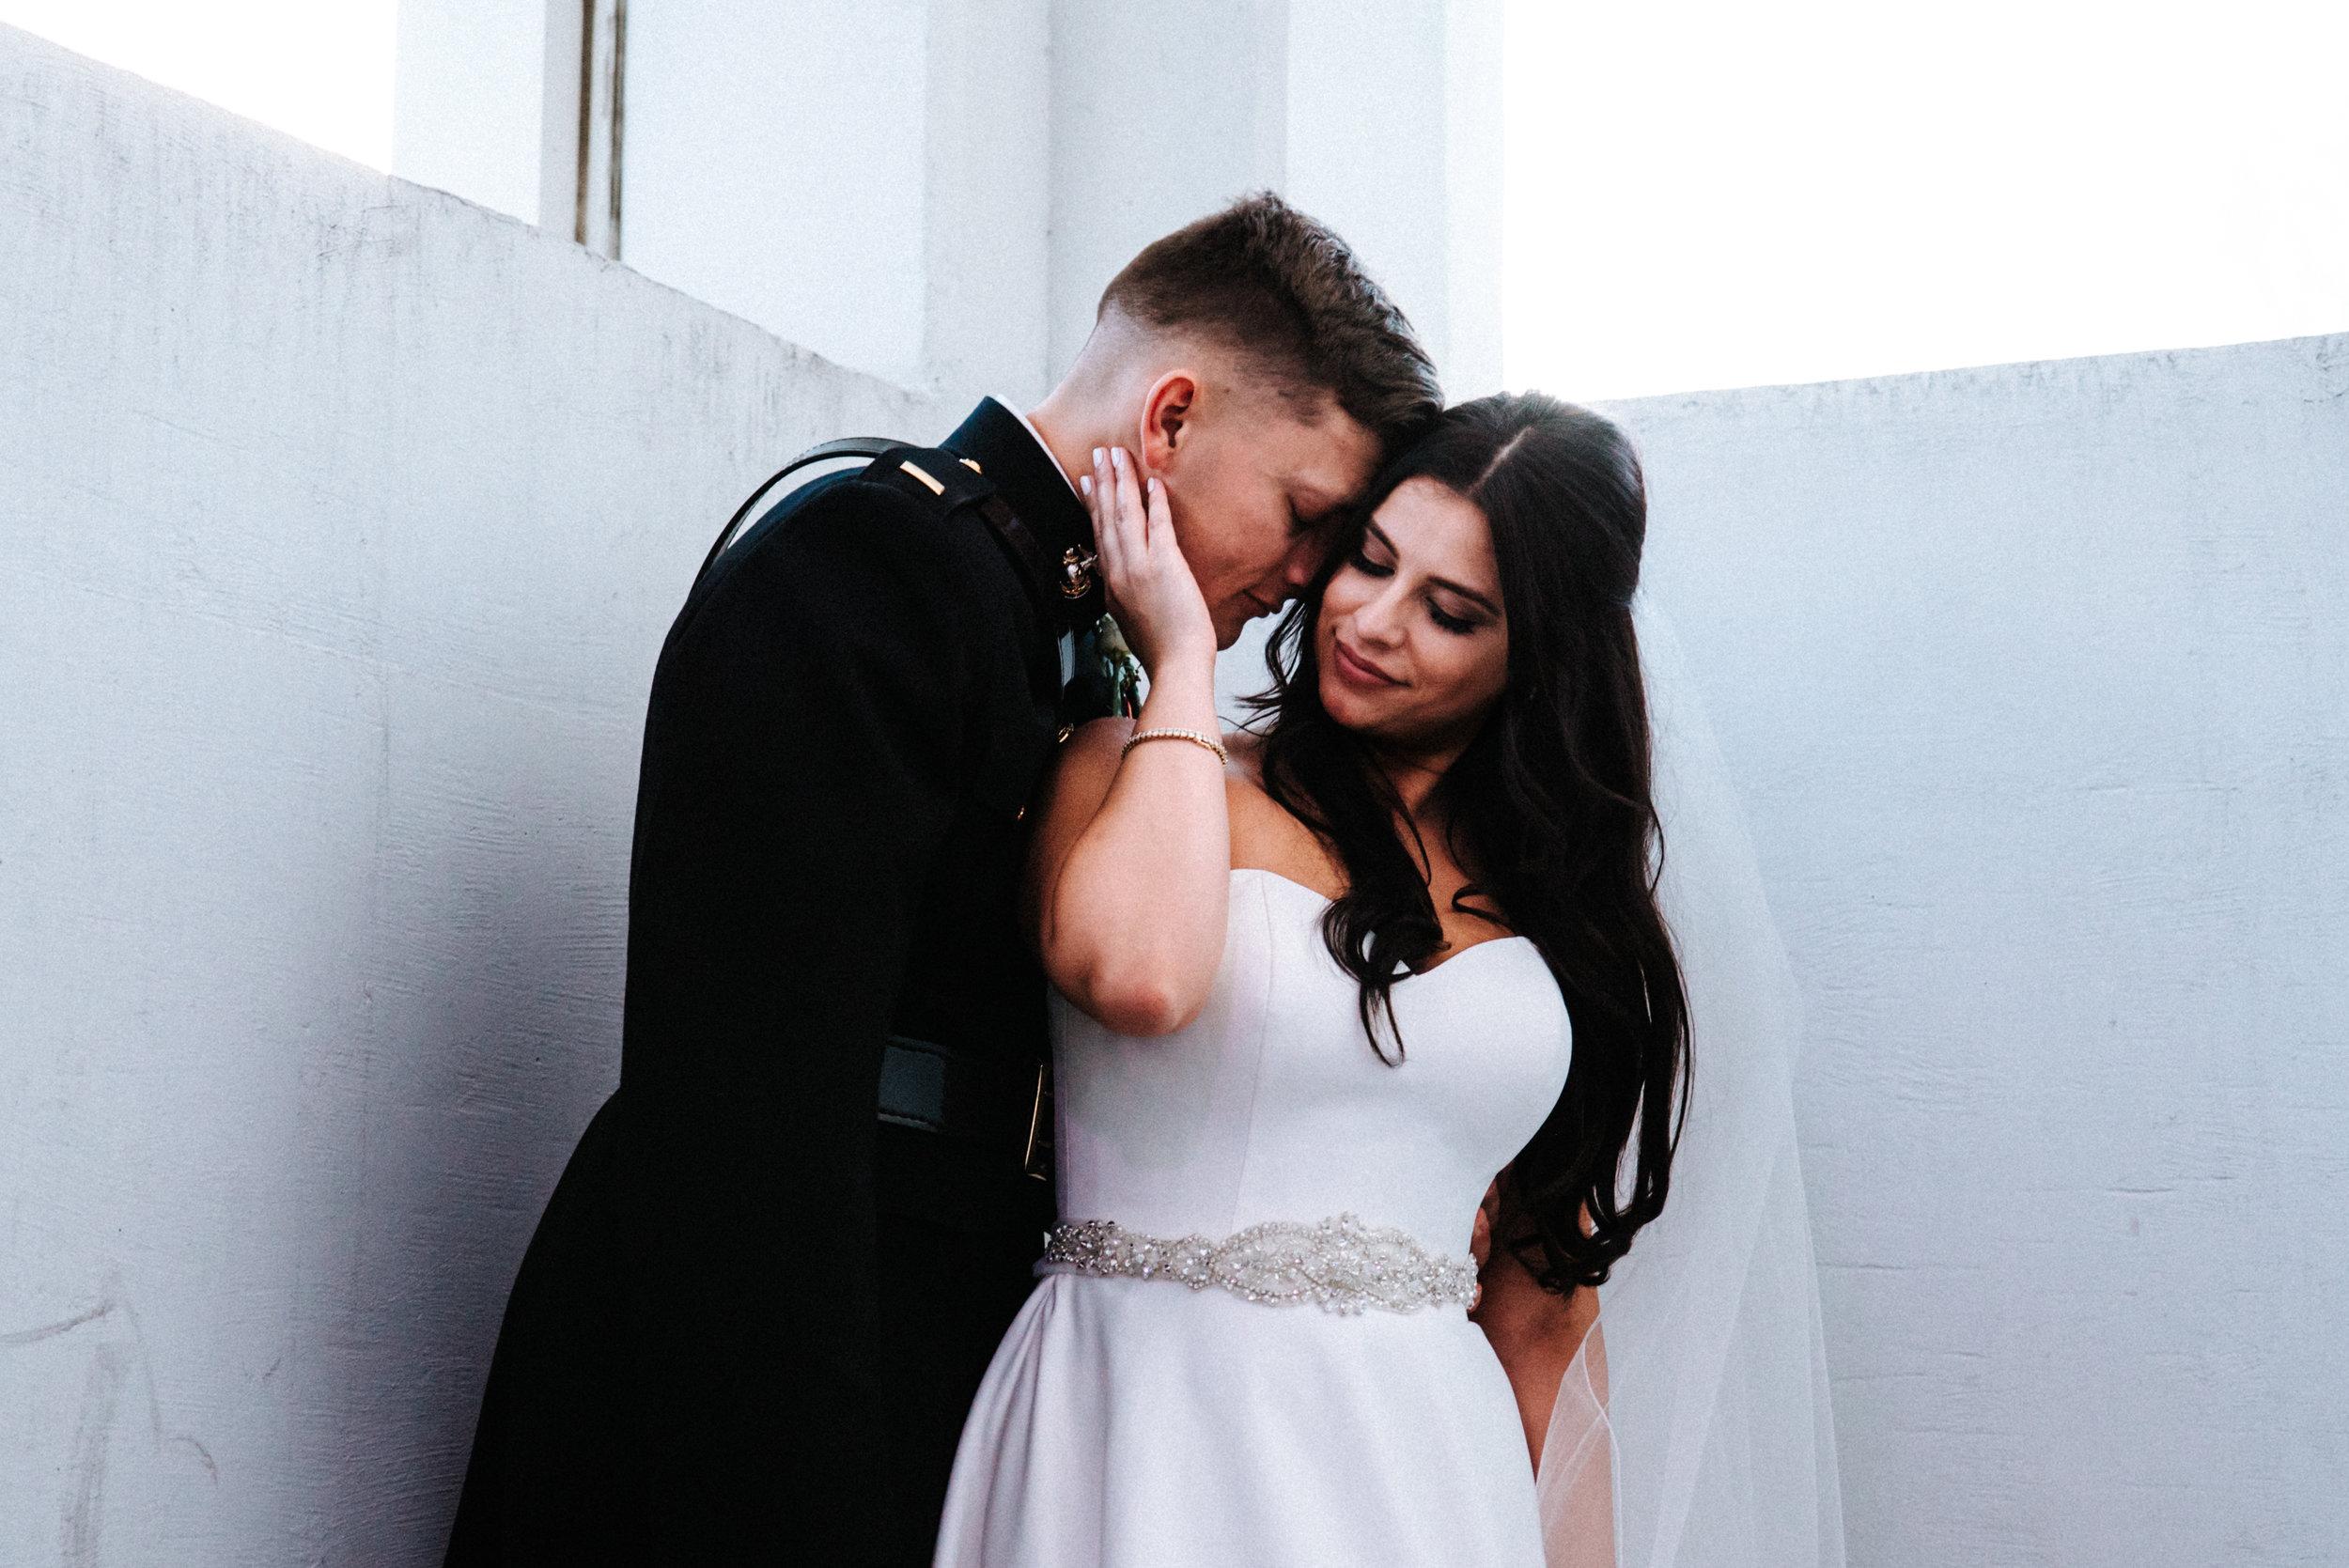 +Raleigh Wedding +North Carolina +Photographer +Wedding Photographer +Engagement Photographer +All Saints Chapel-6985.jpg